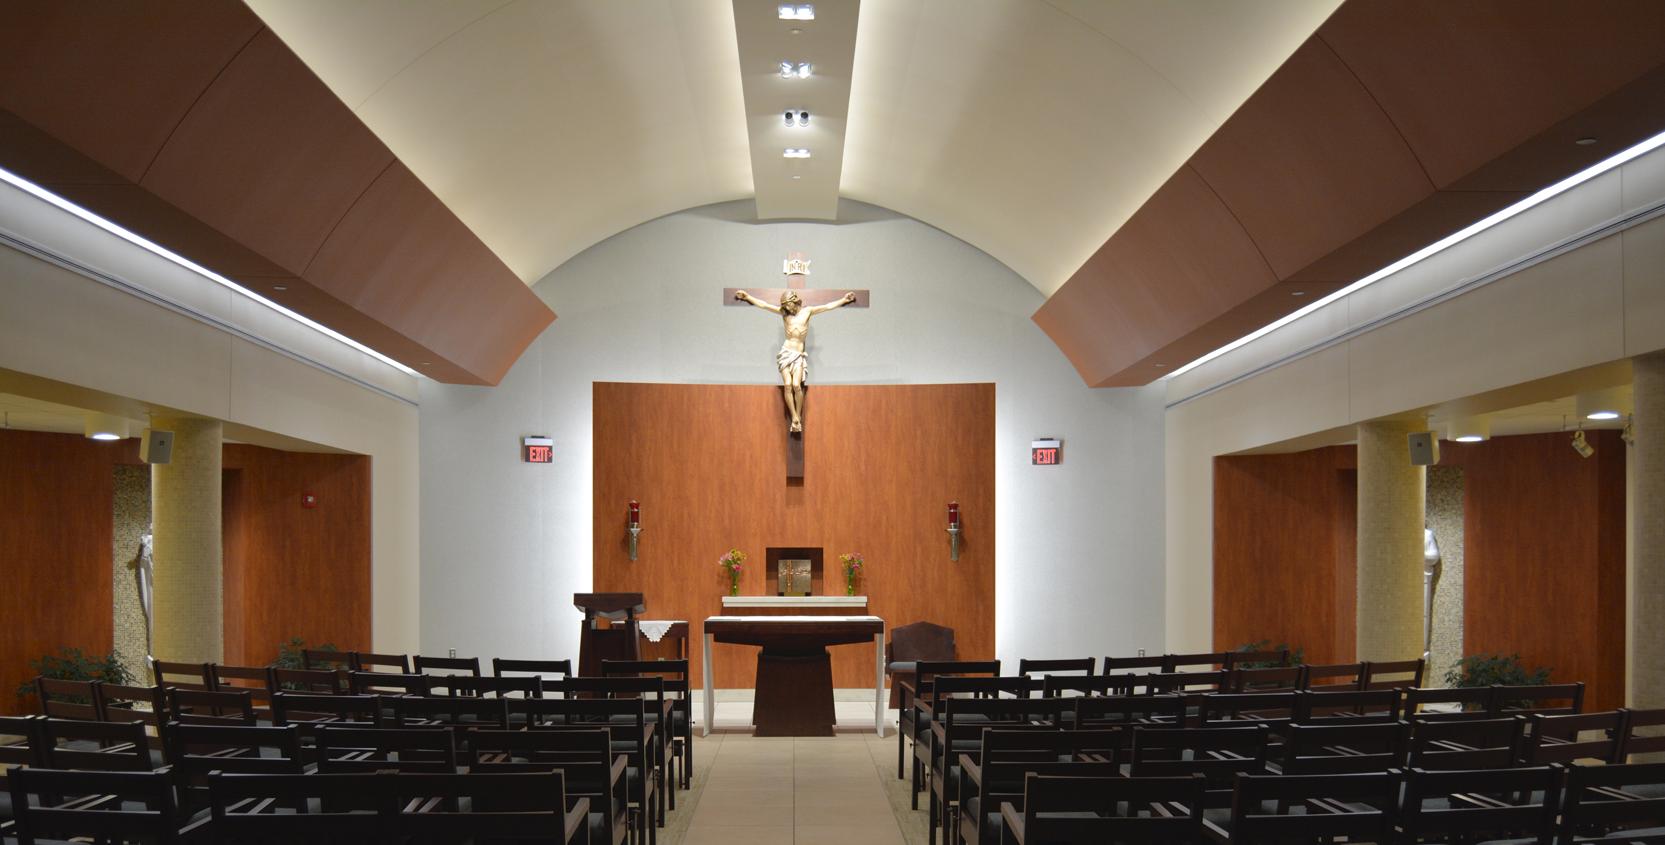 St-Joseph-Mercy-Oakland-South-Patient-Tower-Chapel-5-1665x845